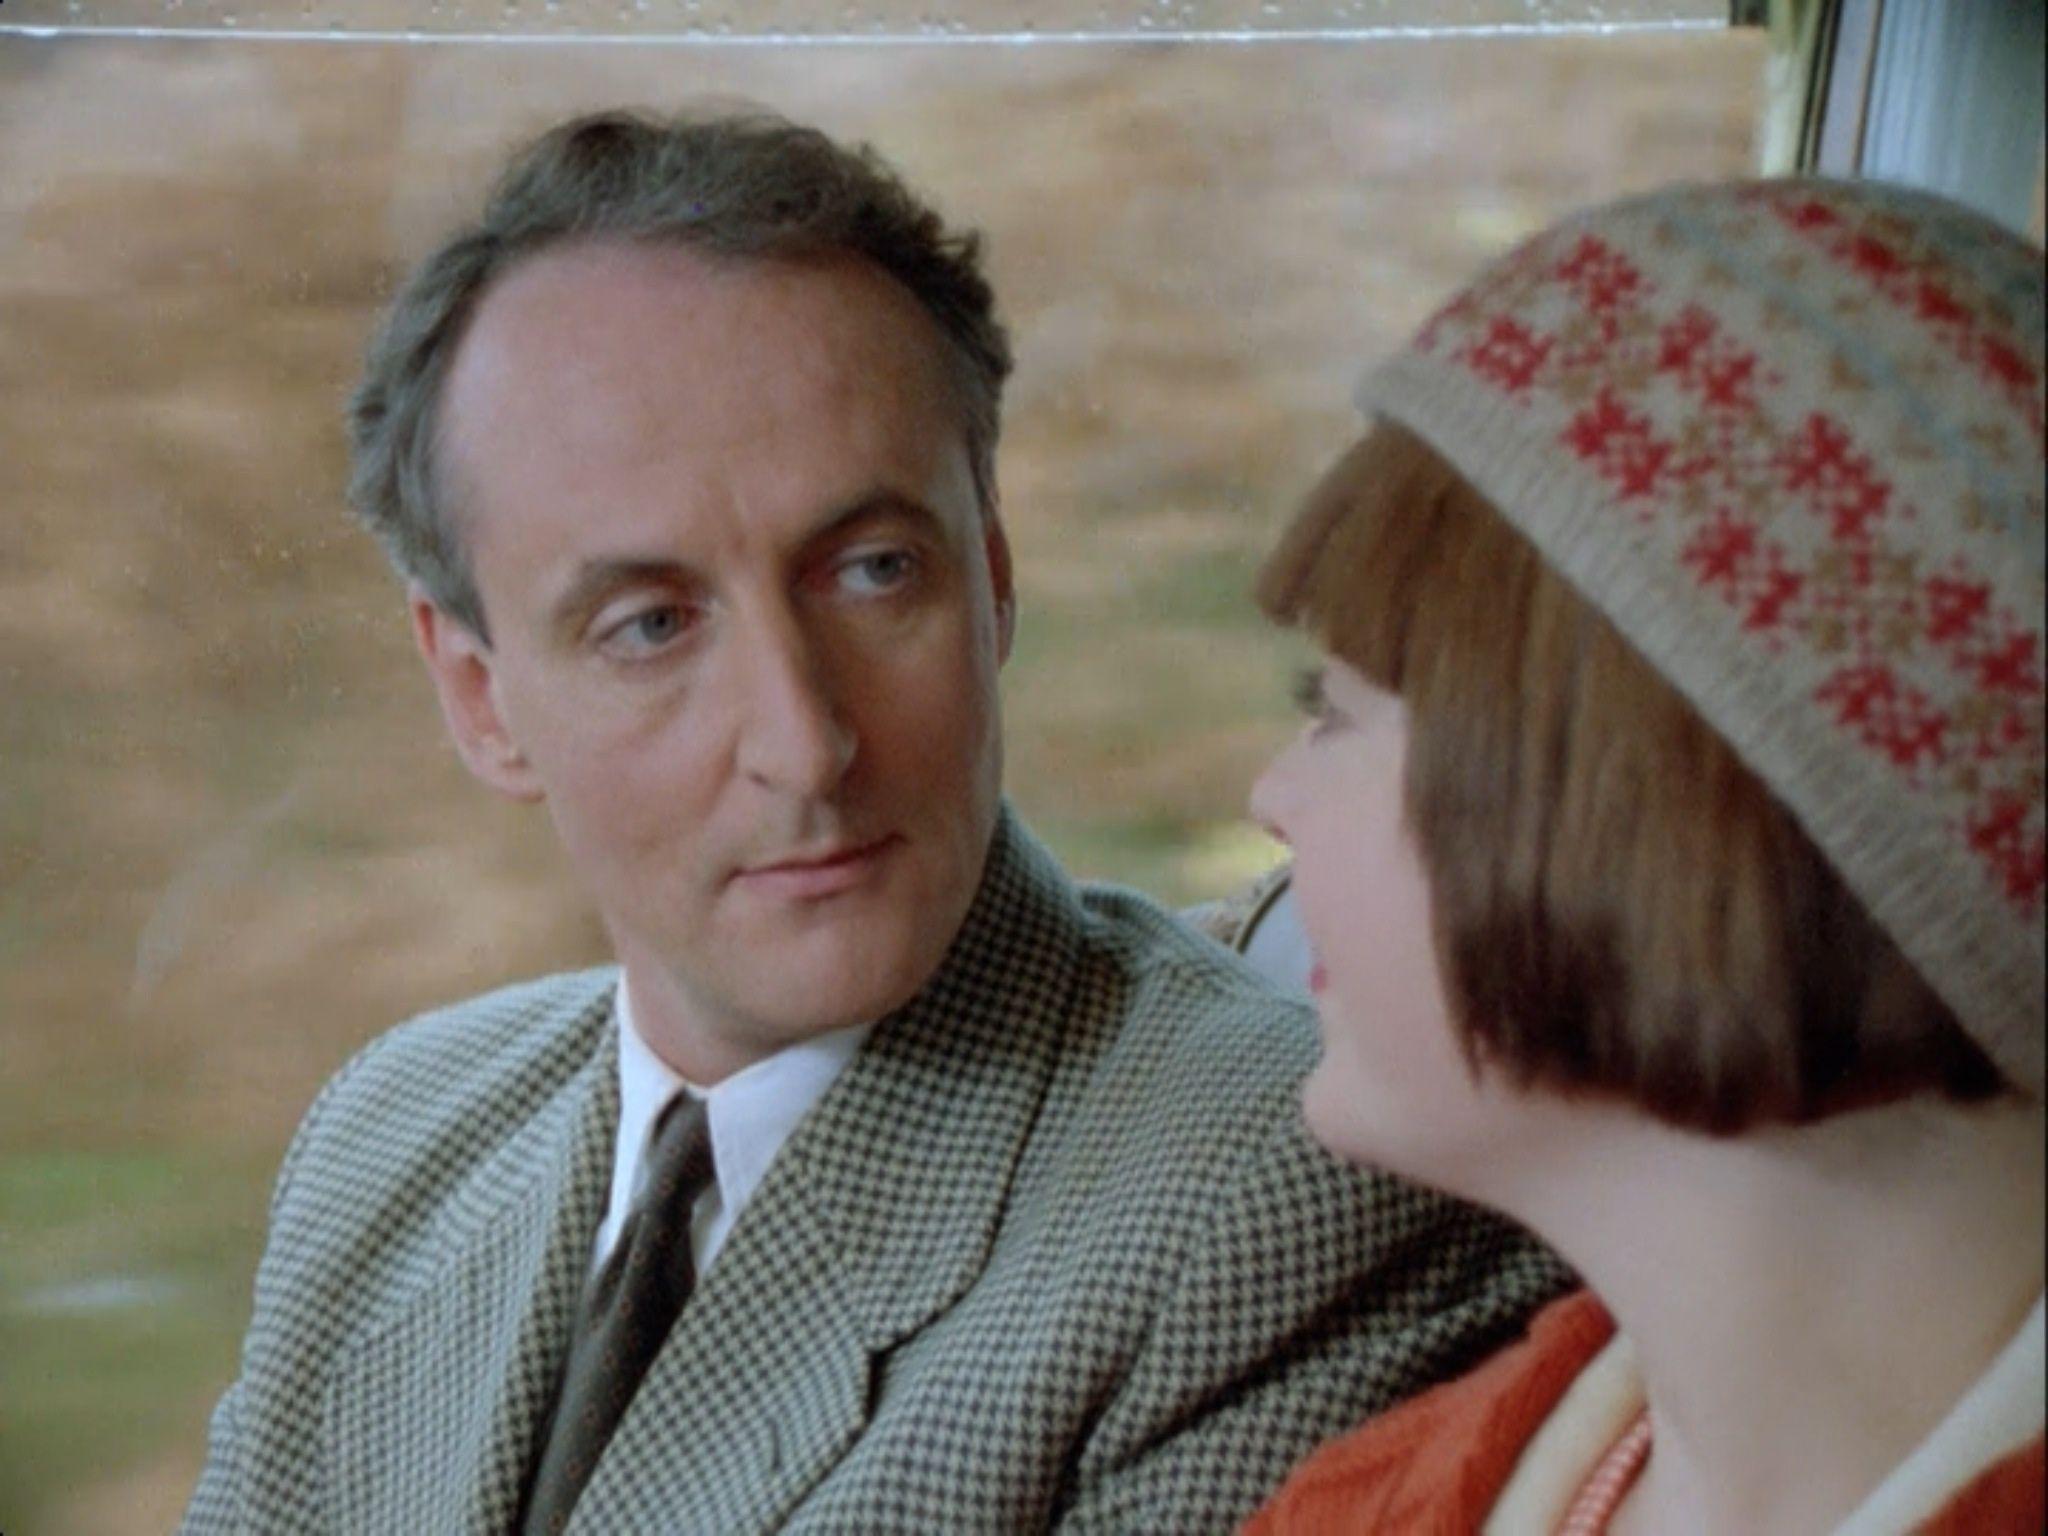 Agatha Christie S Poirot Double Sin Starring This Knit Hat Agatha Christie Hercule Poirot Agatha Christie S Poirot